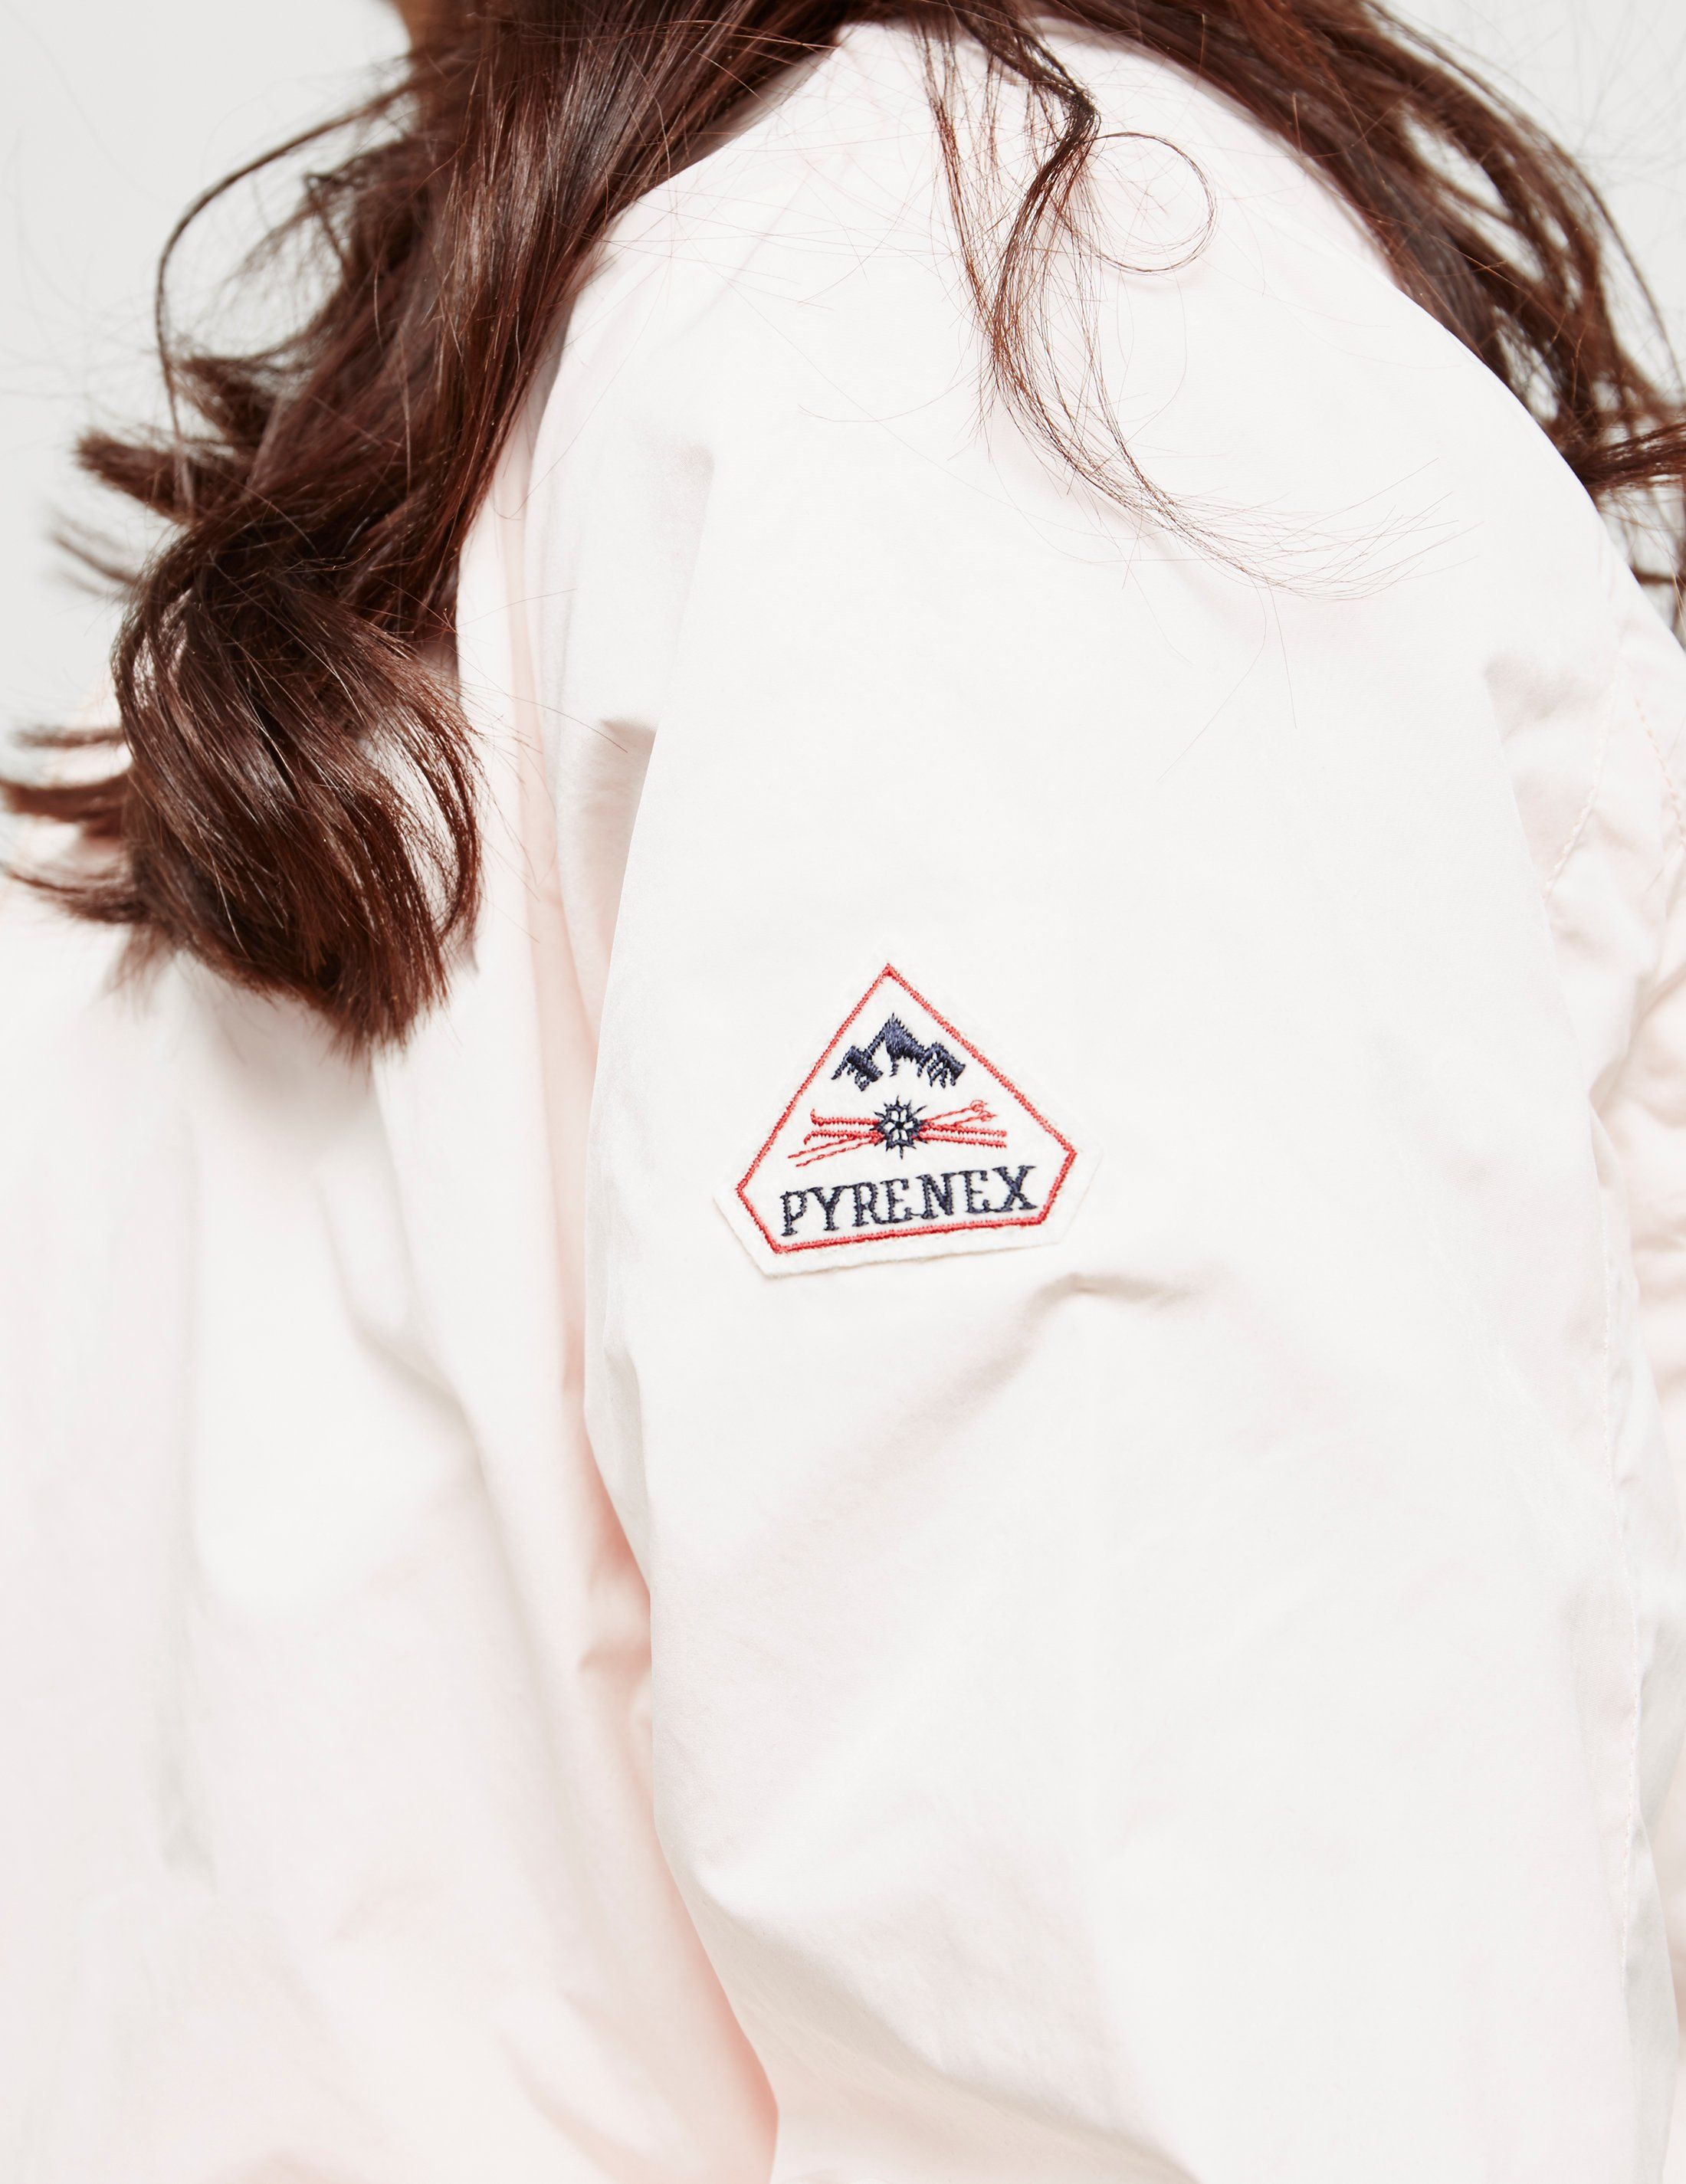 Pyrenex Jasmin Lightweight Jacket - Online Exclusive